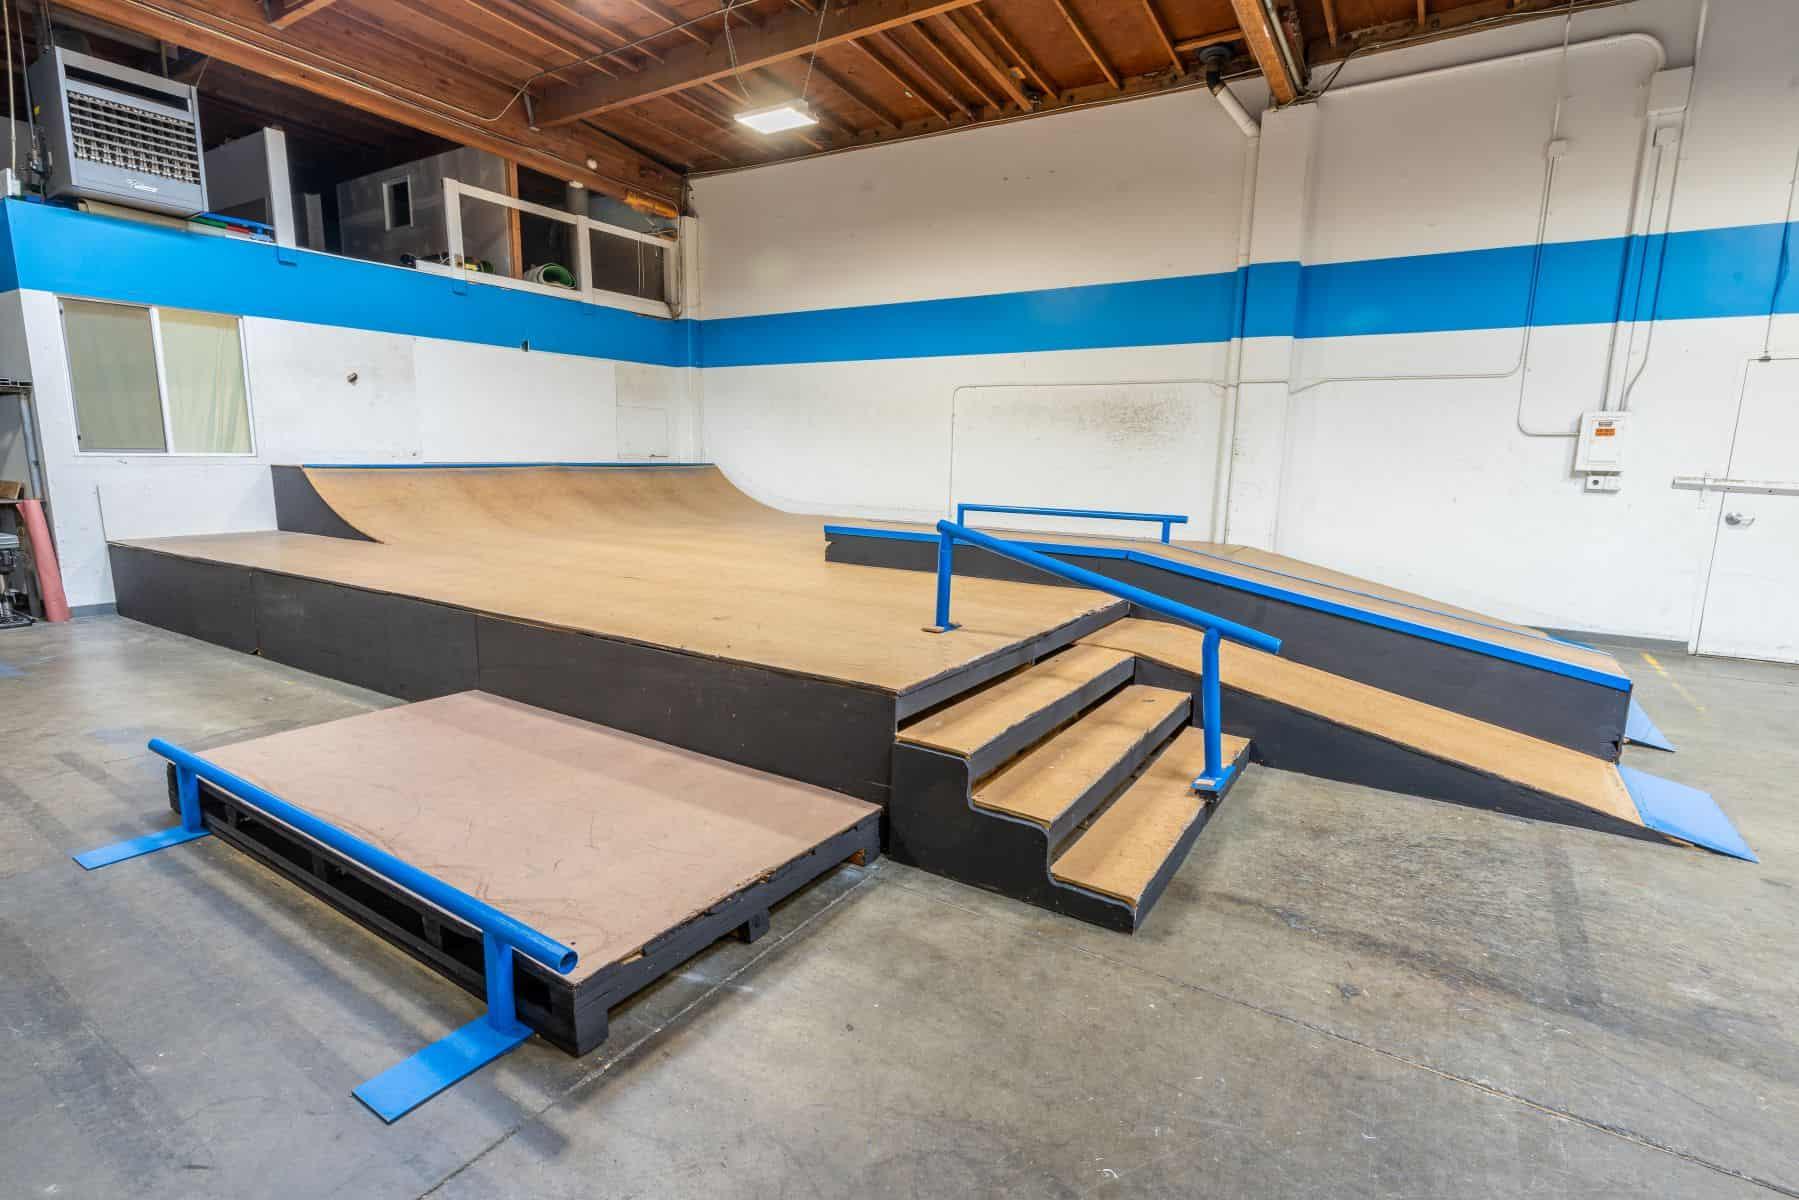 Rob Skate - San Leandro Private Skatepark 11